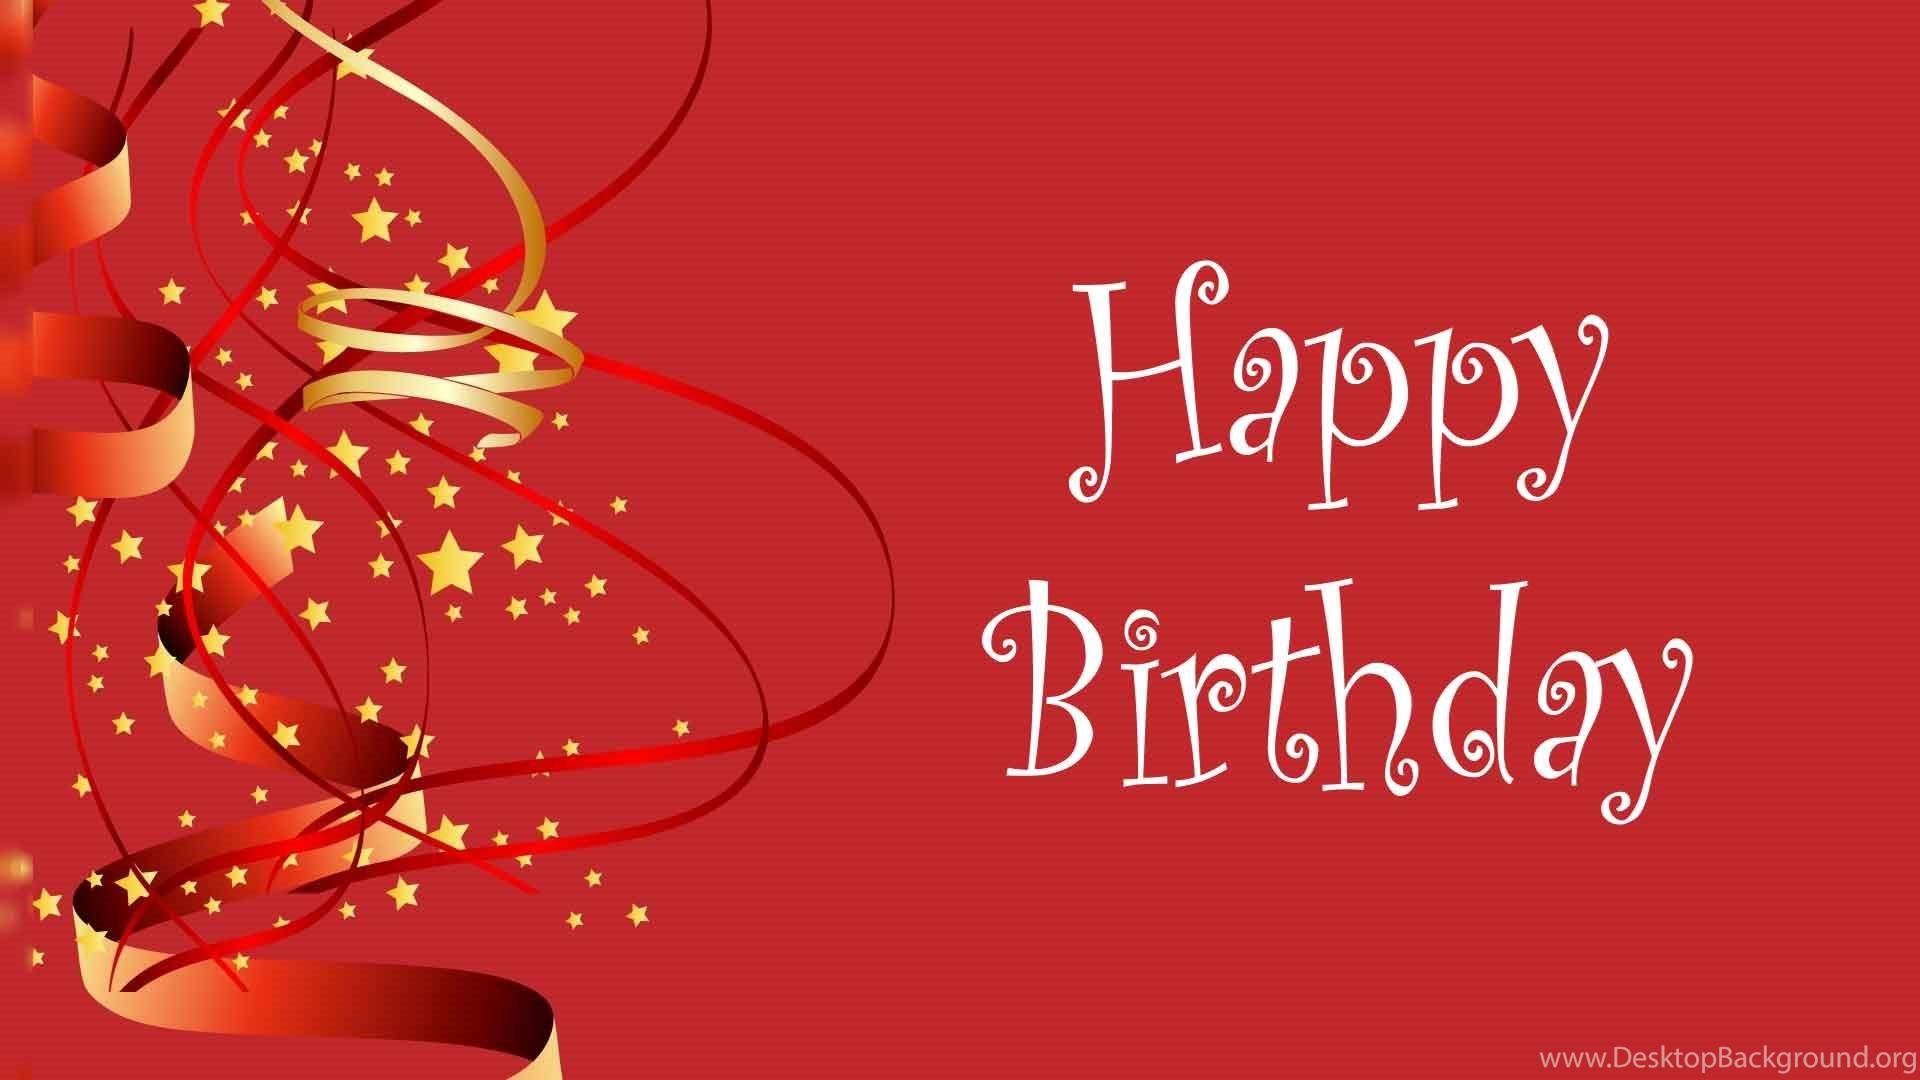 Birthday Card Backgrounds Happy Birthday Cake Images Desktop Background